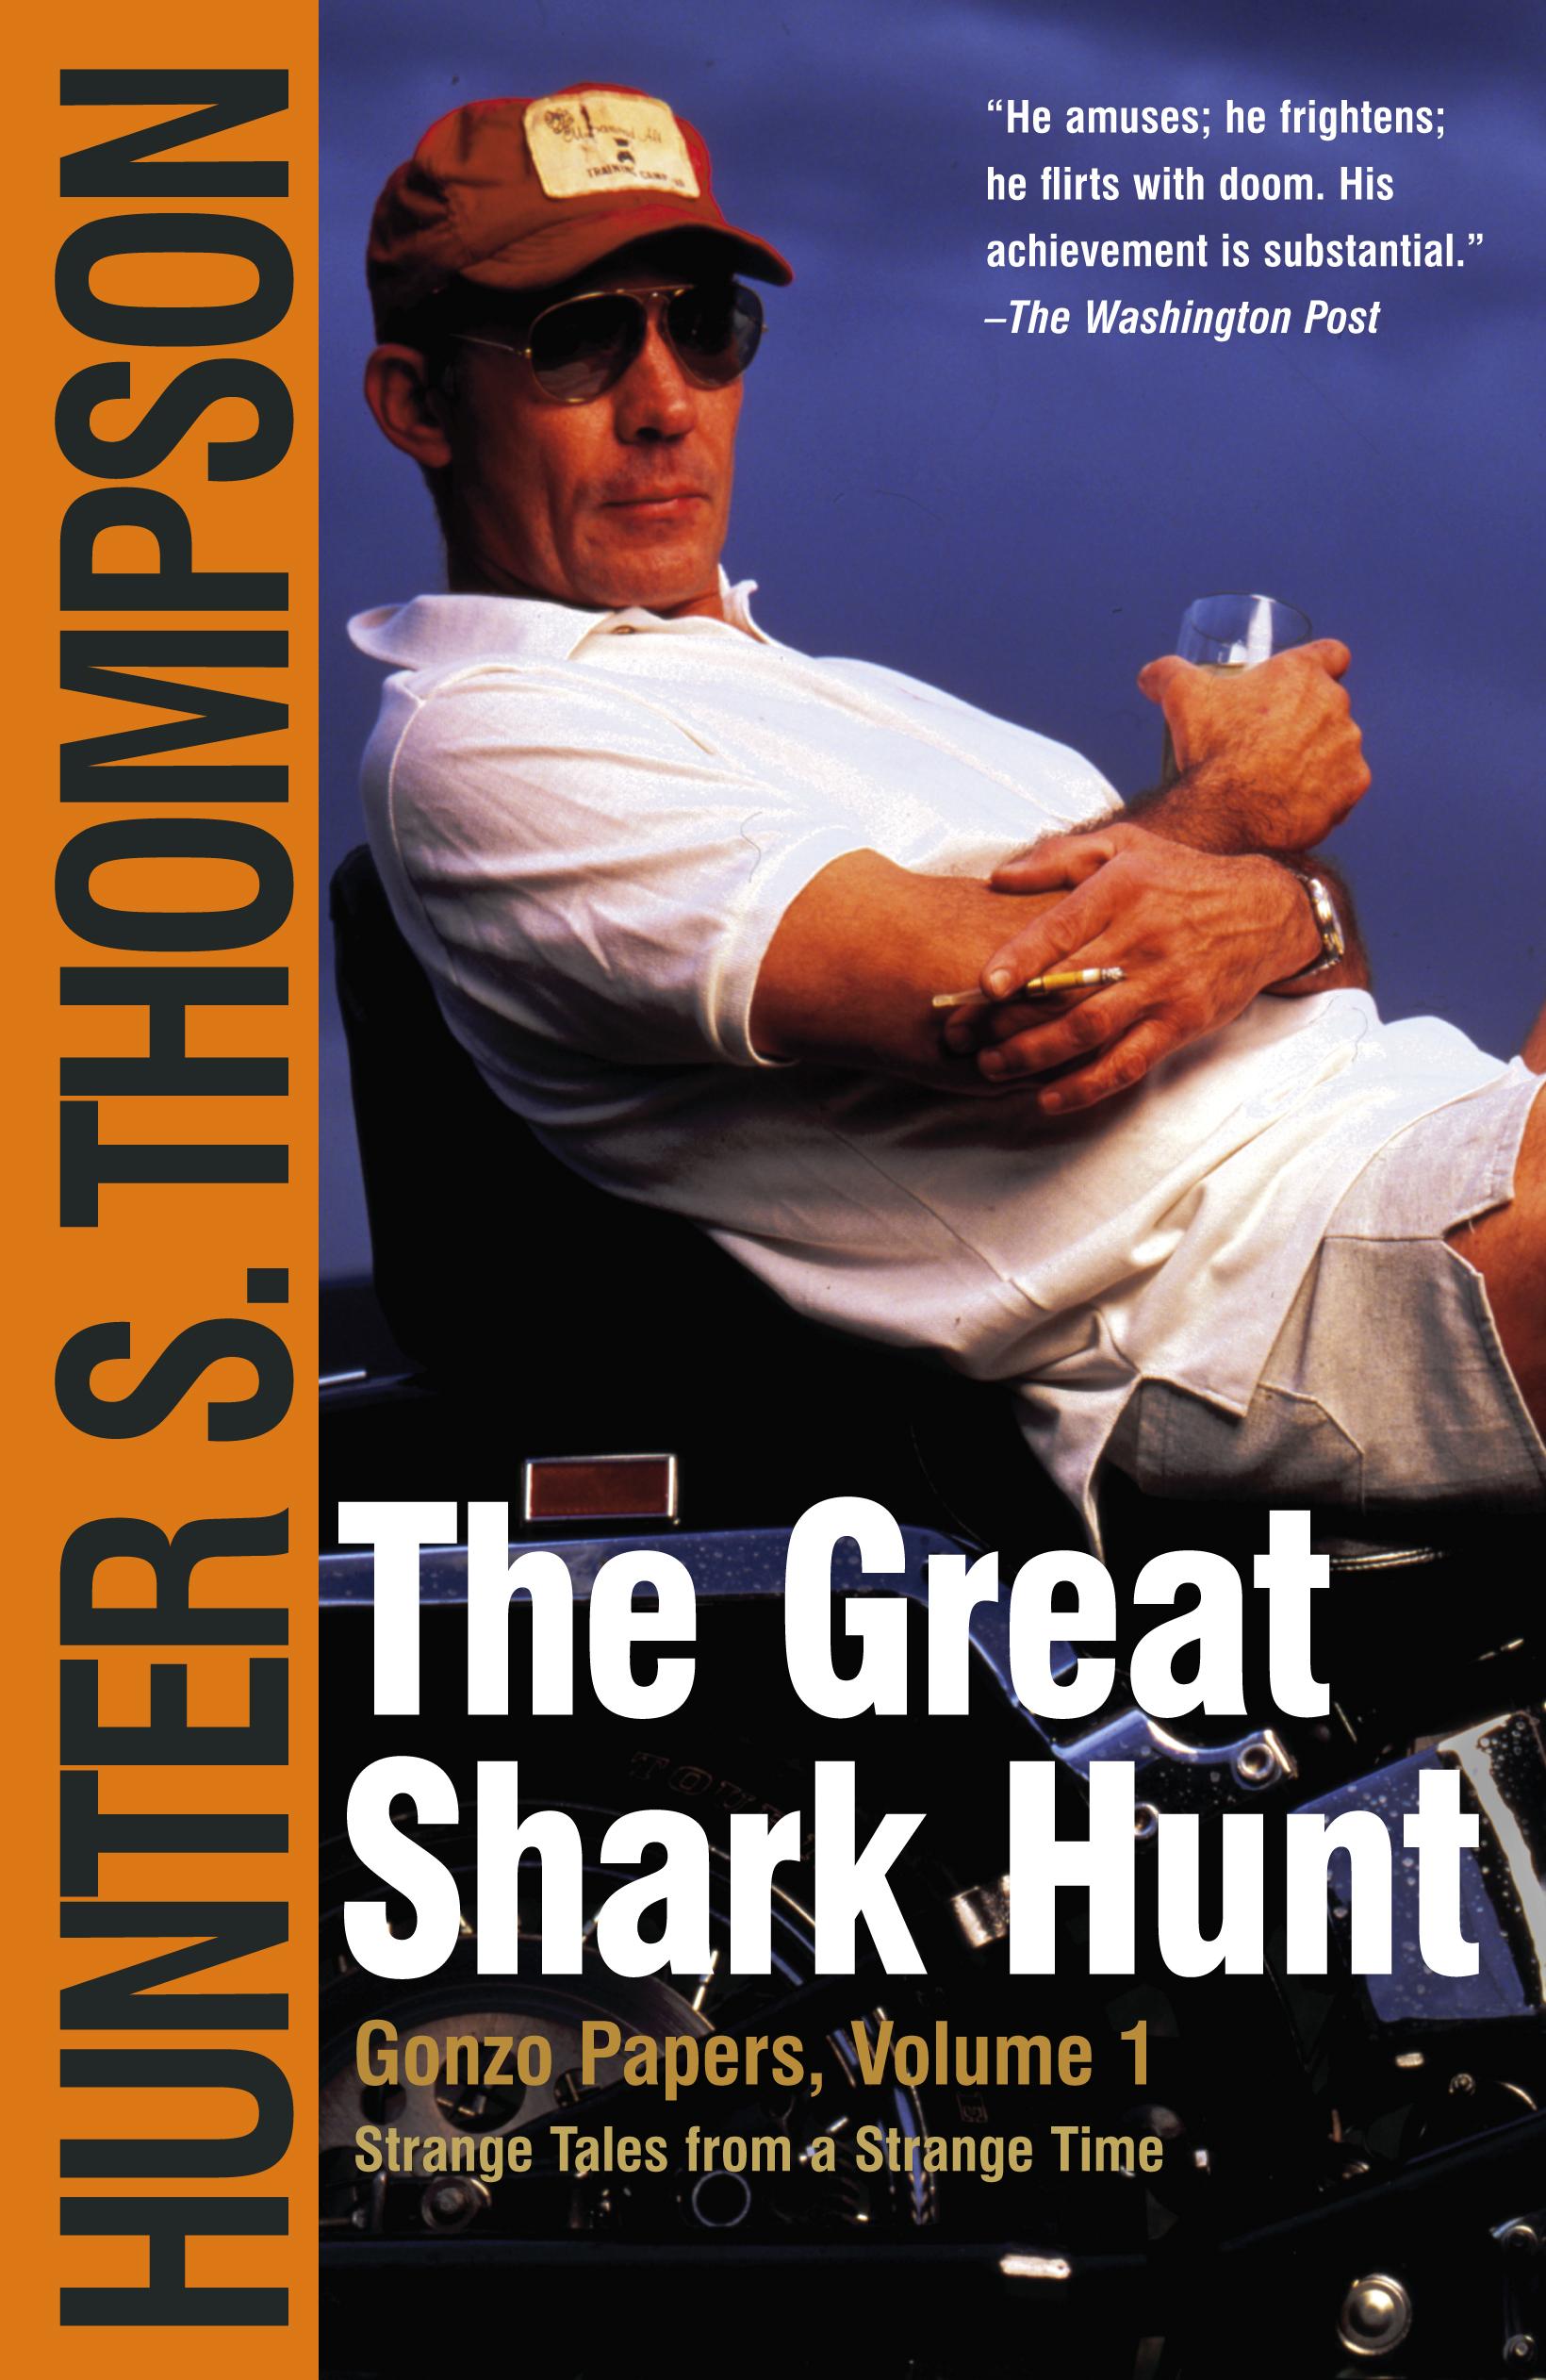 the great shark hunt book by hunter s thompson official  cvr9780743250450 9780743250450 hr